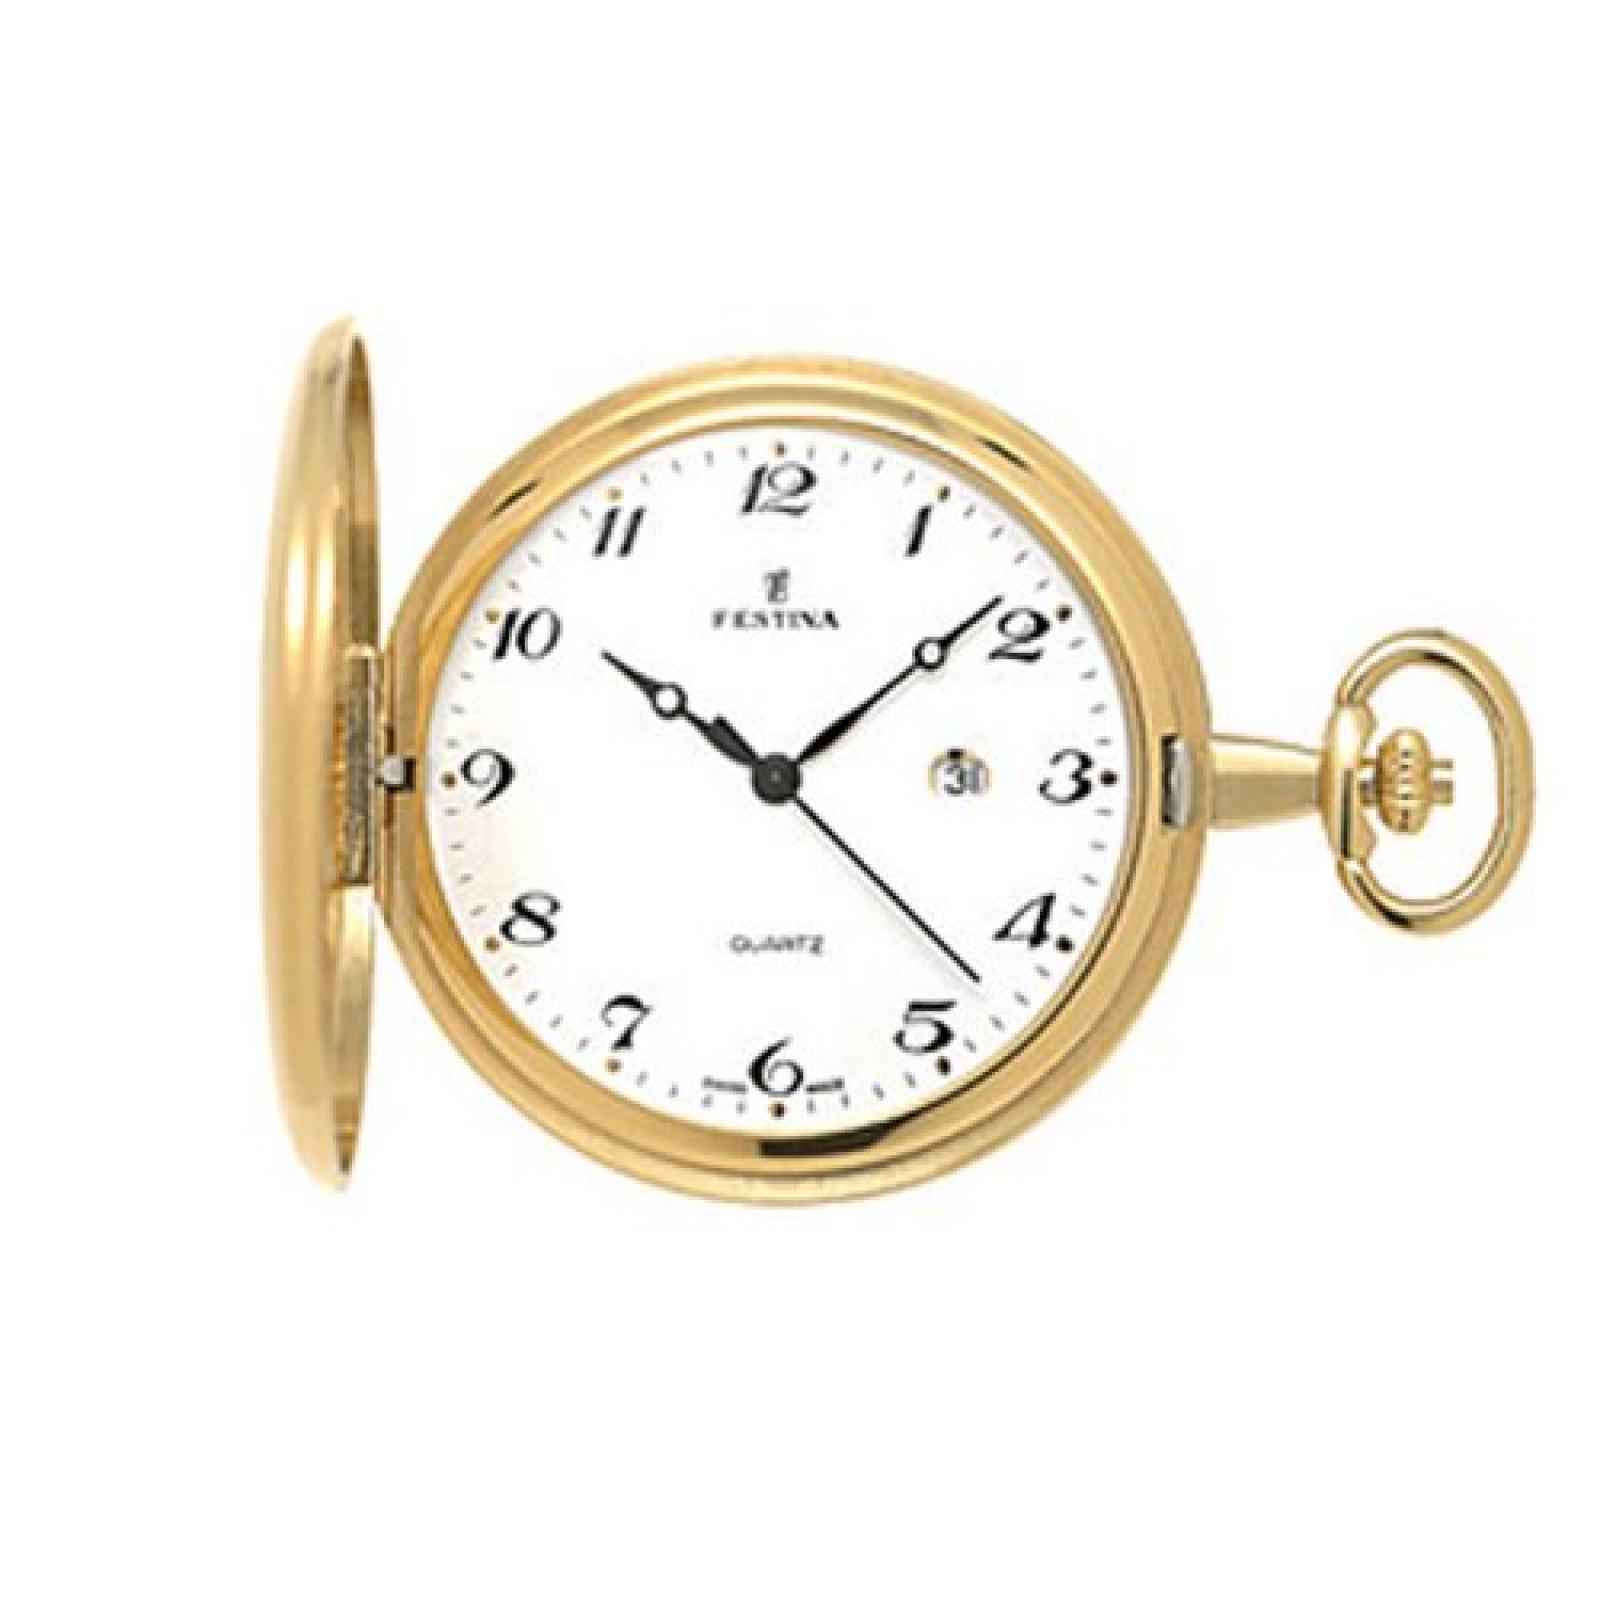 Festina Herren-Armbanduhr XL Klassik Taschenuhren vergoldet Analog Edelstahl beschichtet F2011/1